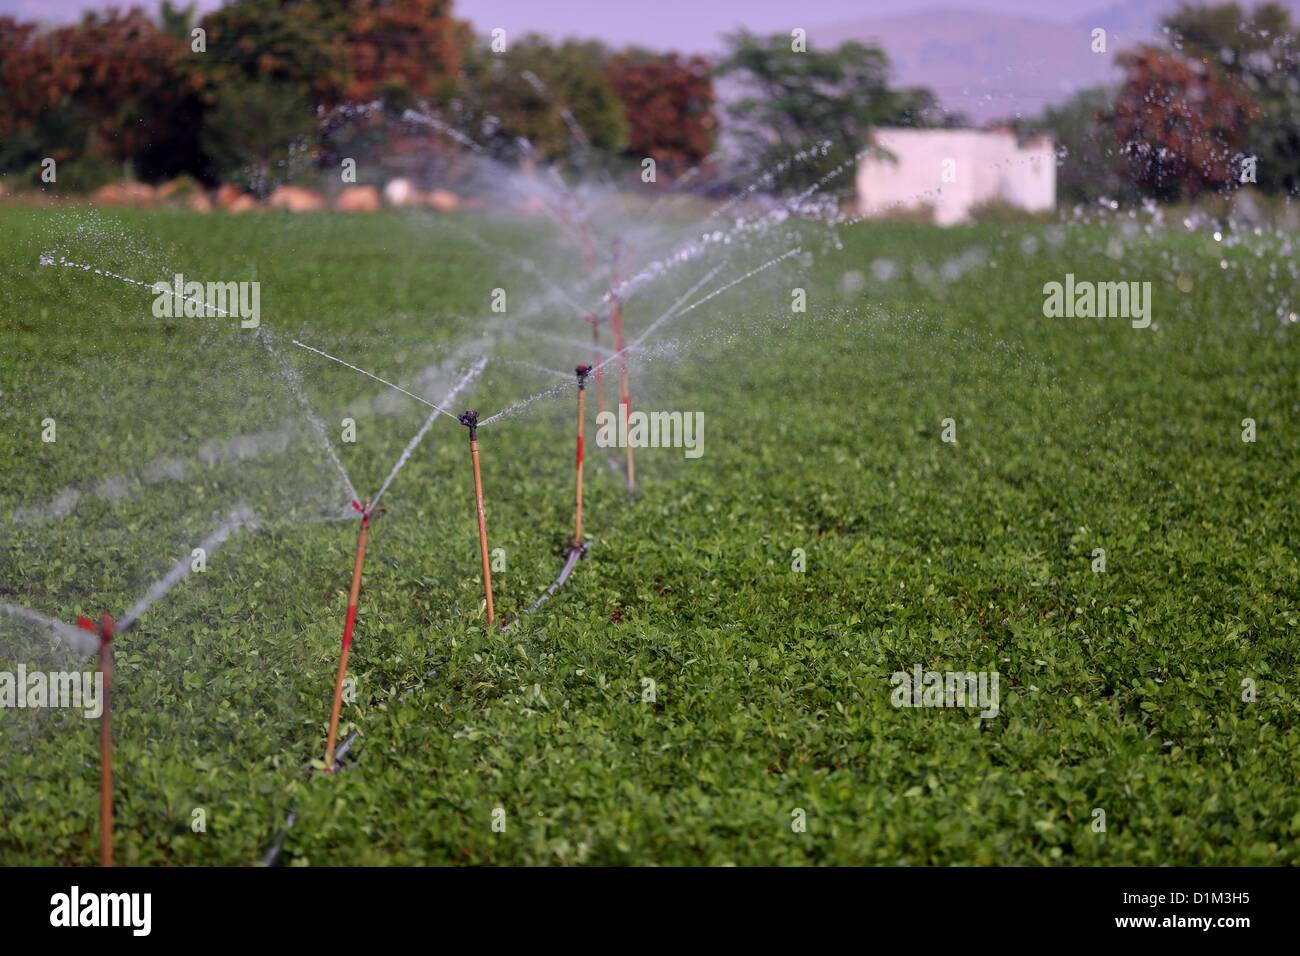 Water sprinkler in a field Andhra Pradesh South India - Stock Image